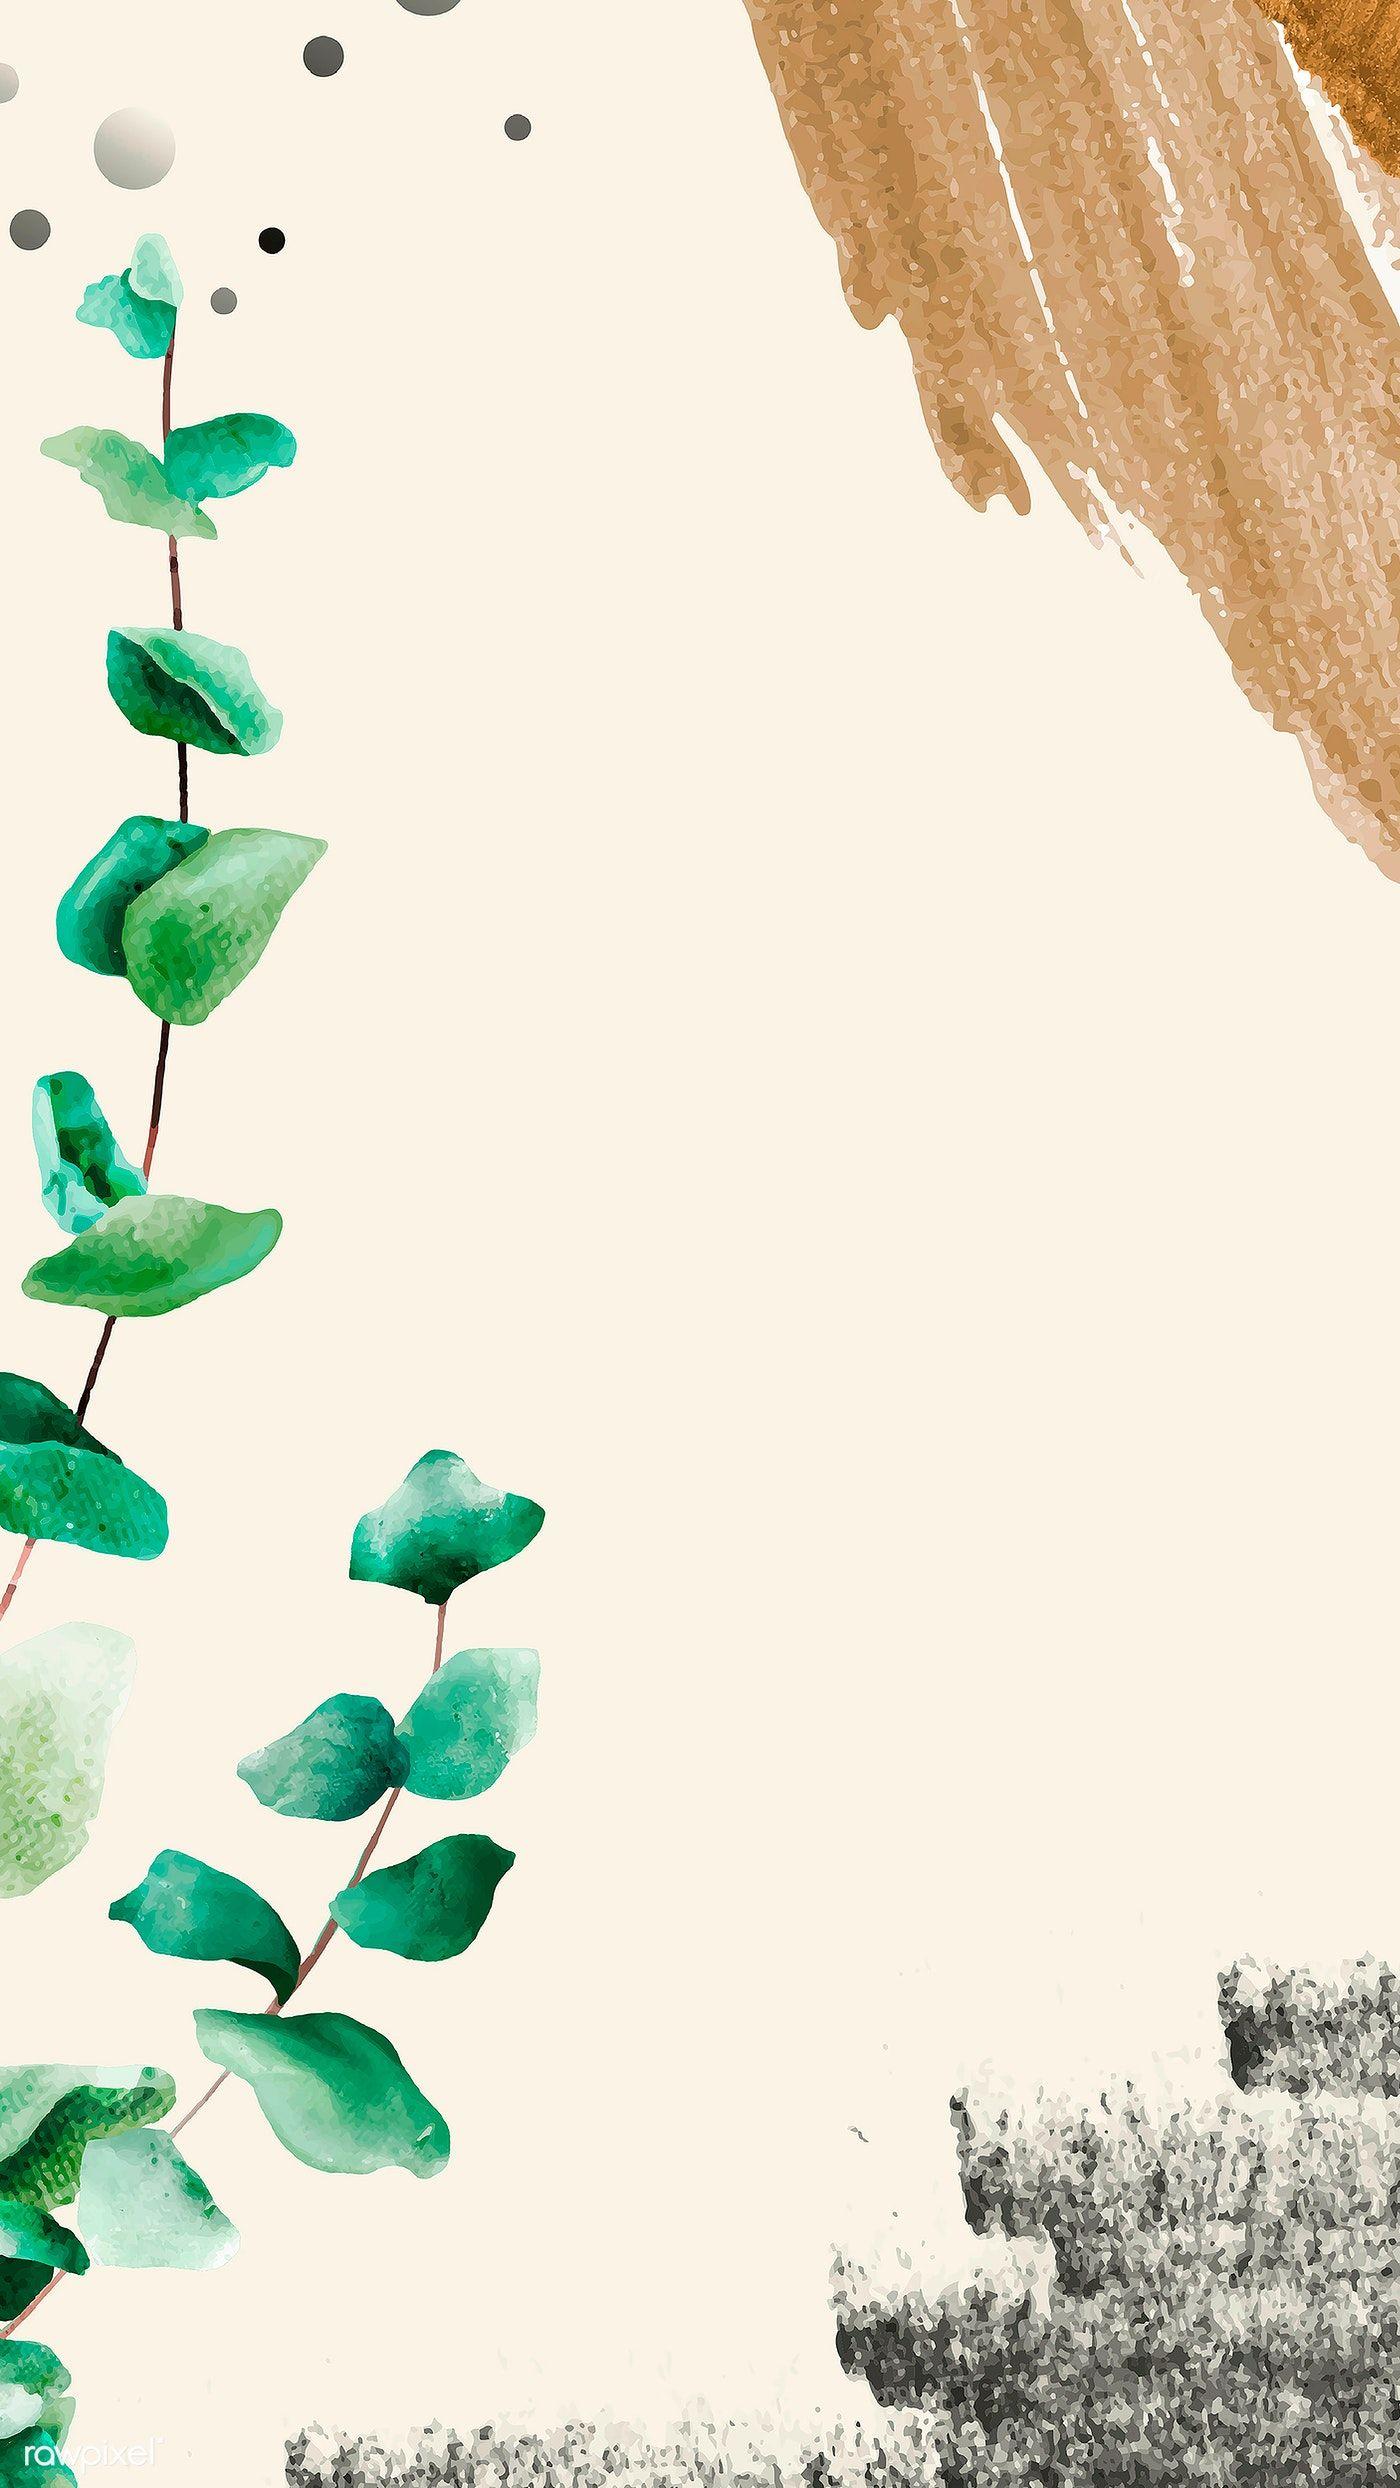 Download premium image of Eucalyptus leaf pattern on beige